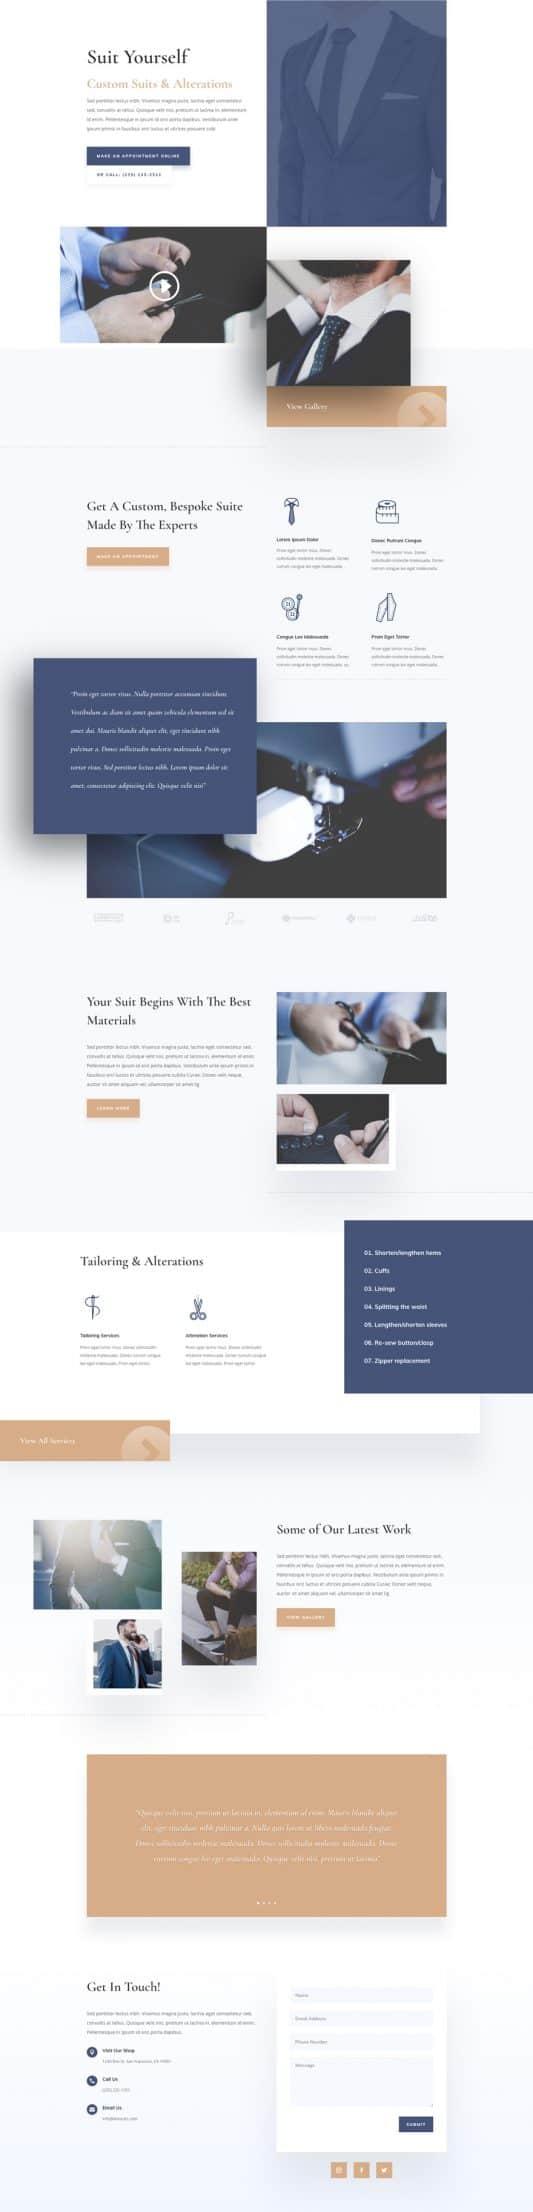 Suit Tailor Web Design 5